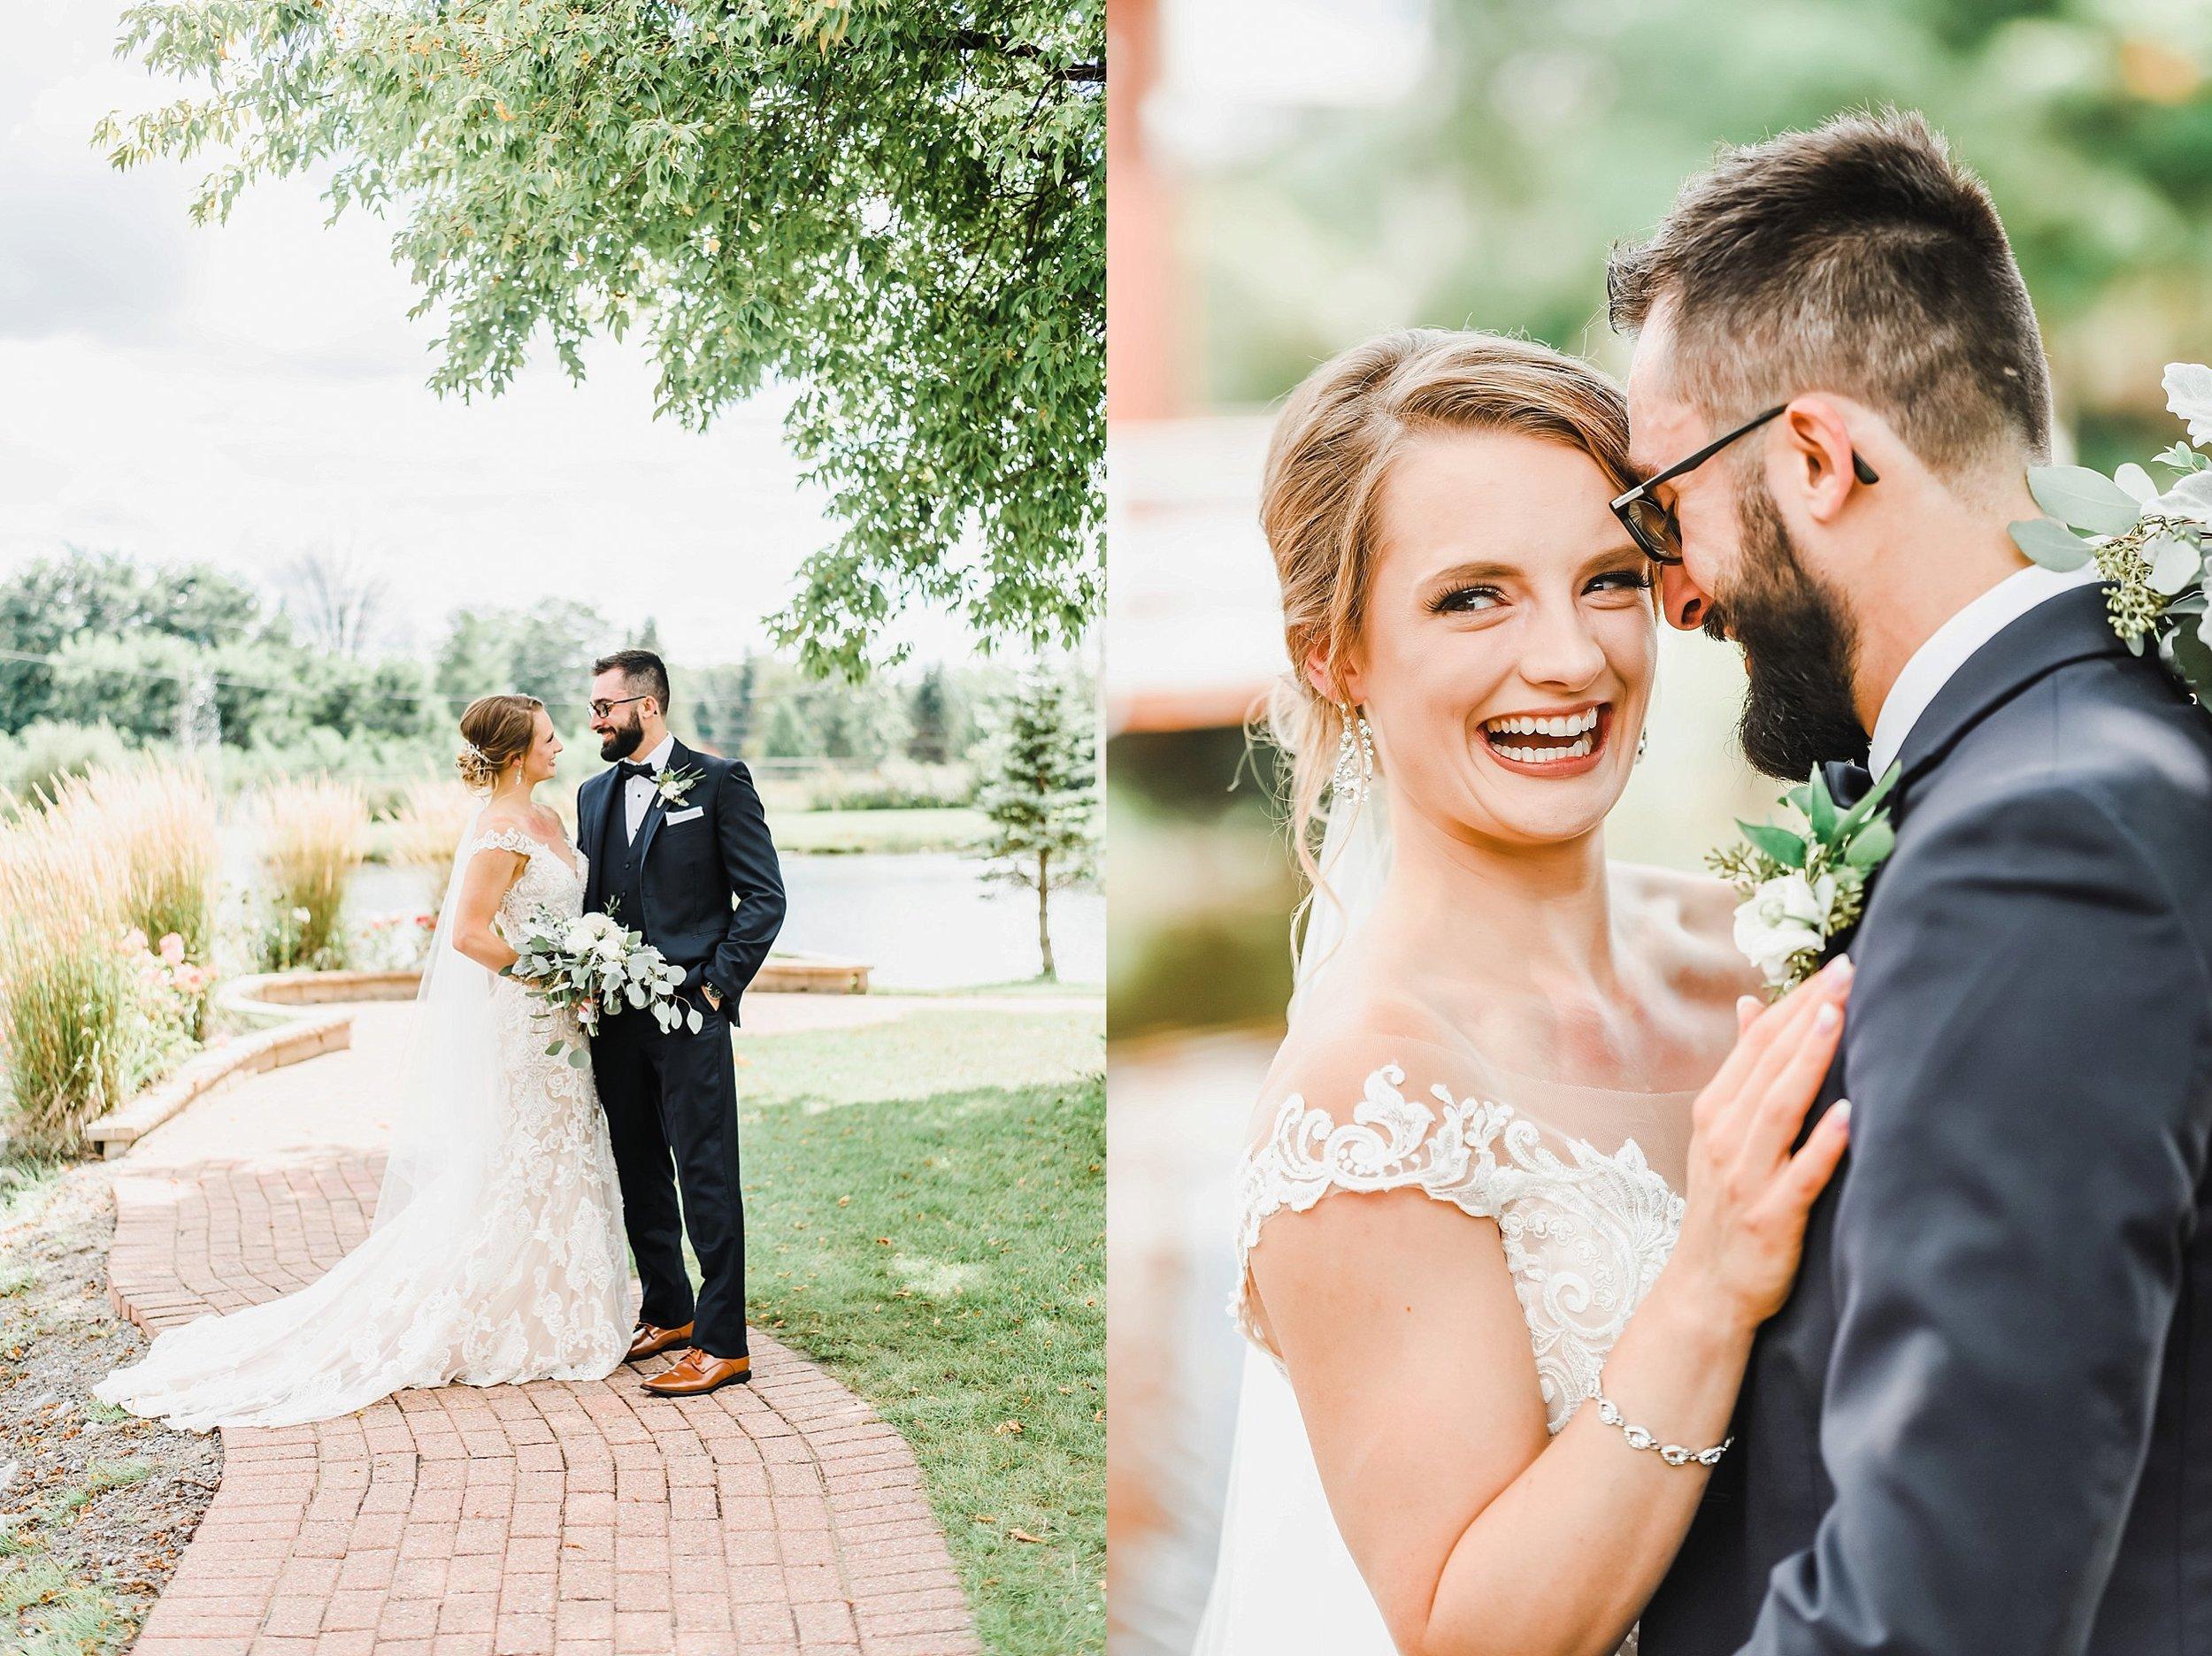 light airy indie fine art ottawa wedding photographer | Ali and Batoul Photography_1249.jpg